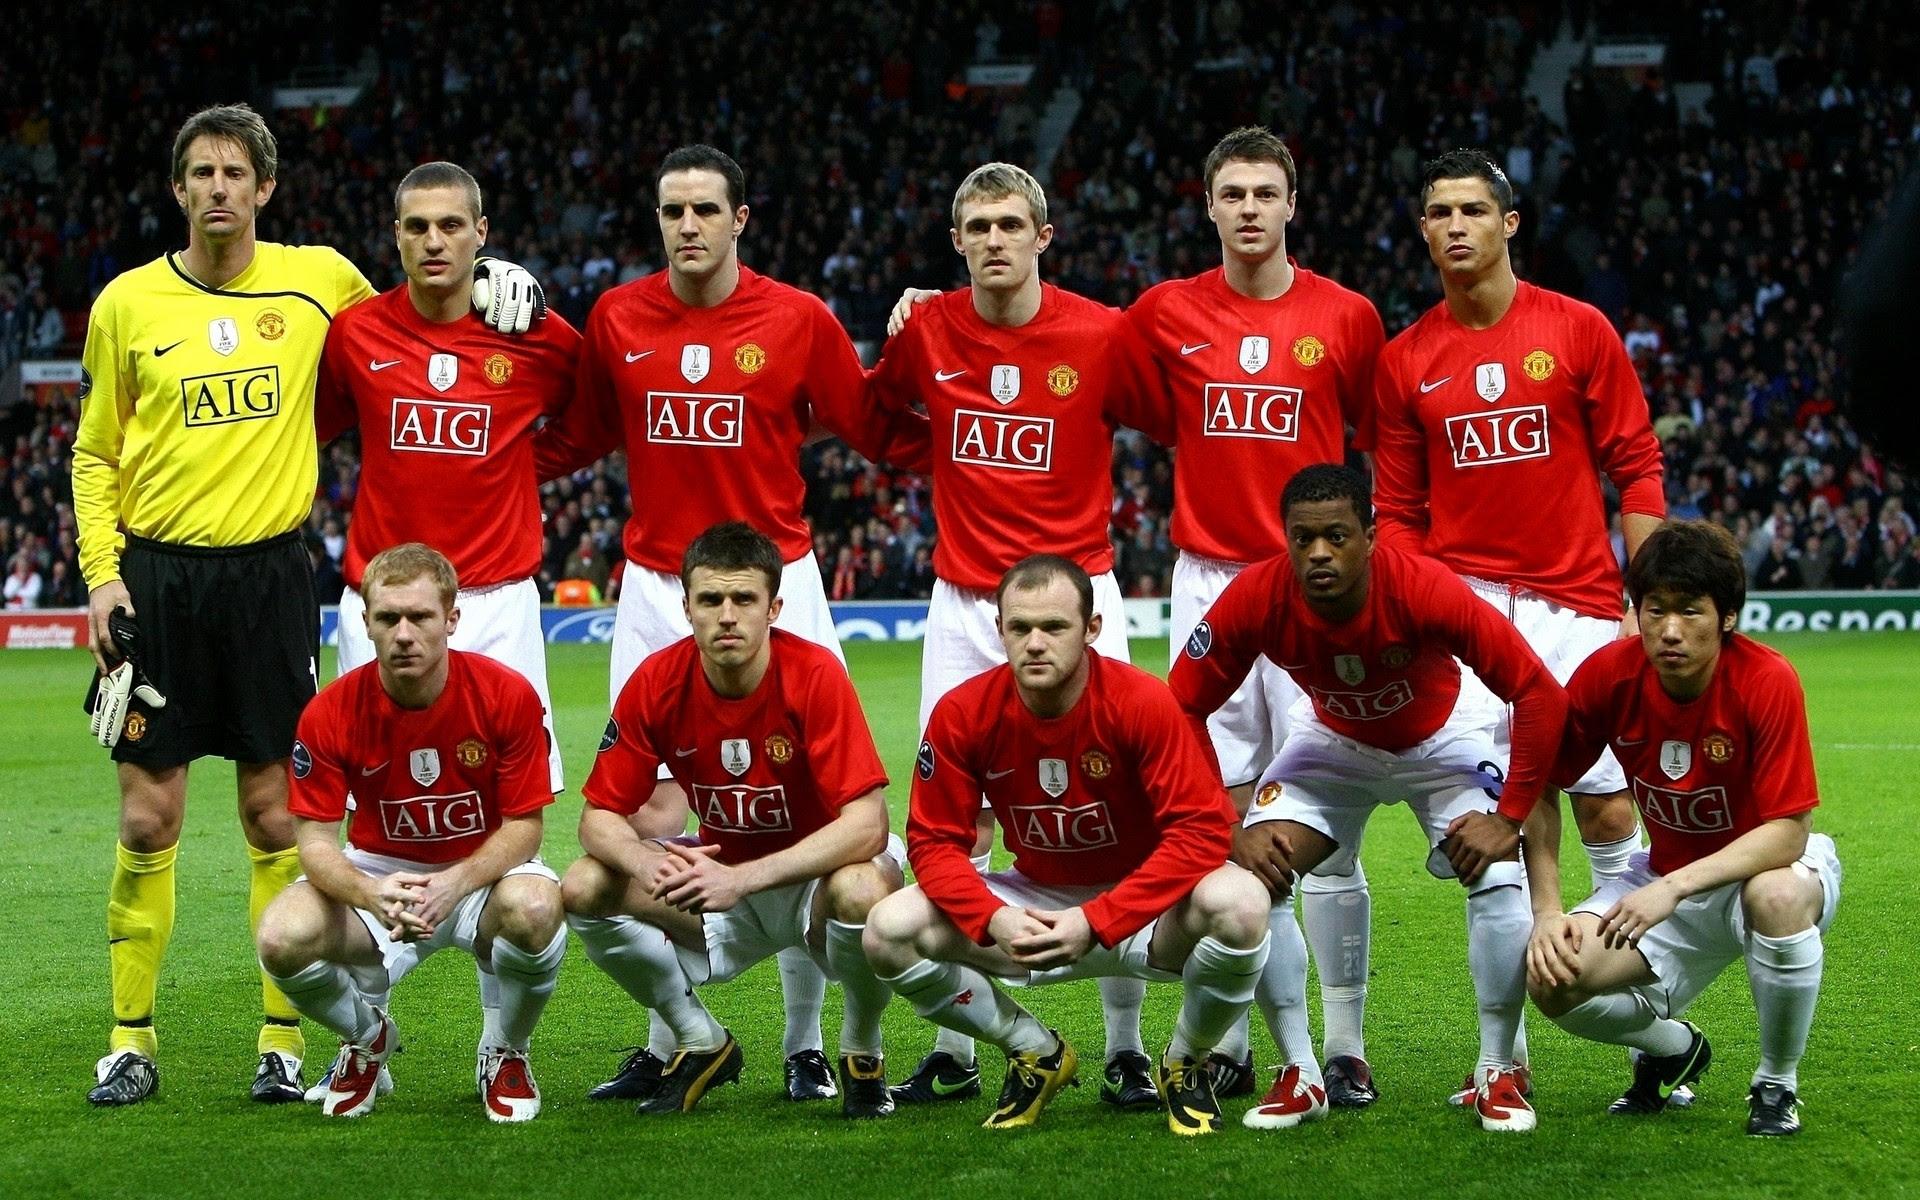 Manchester United FC Squad | Wallpup.com